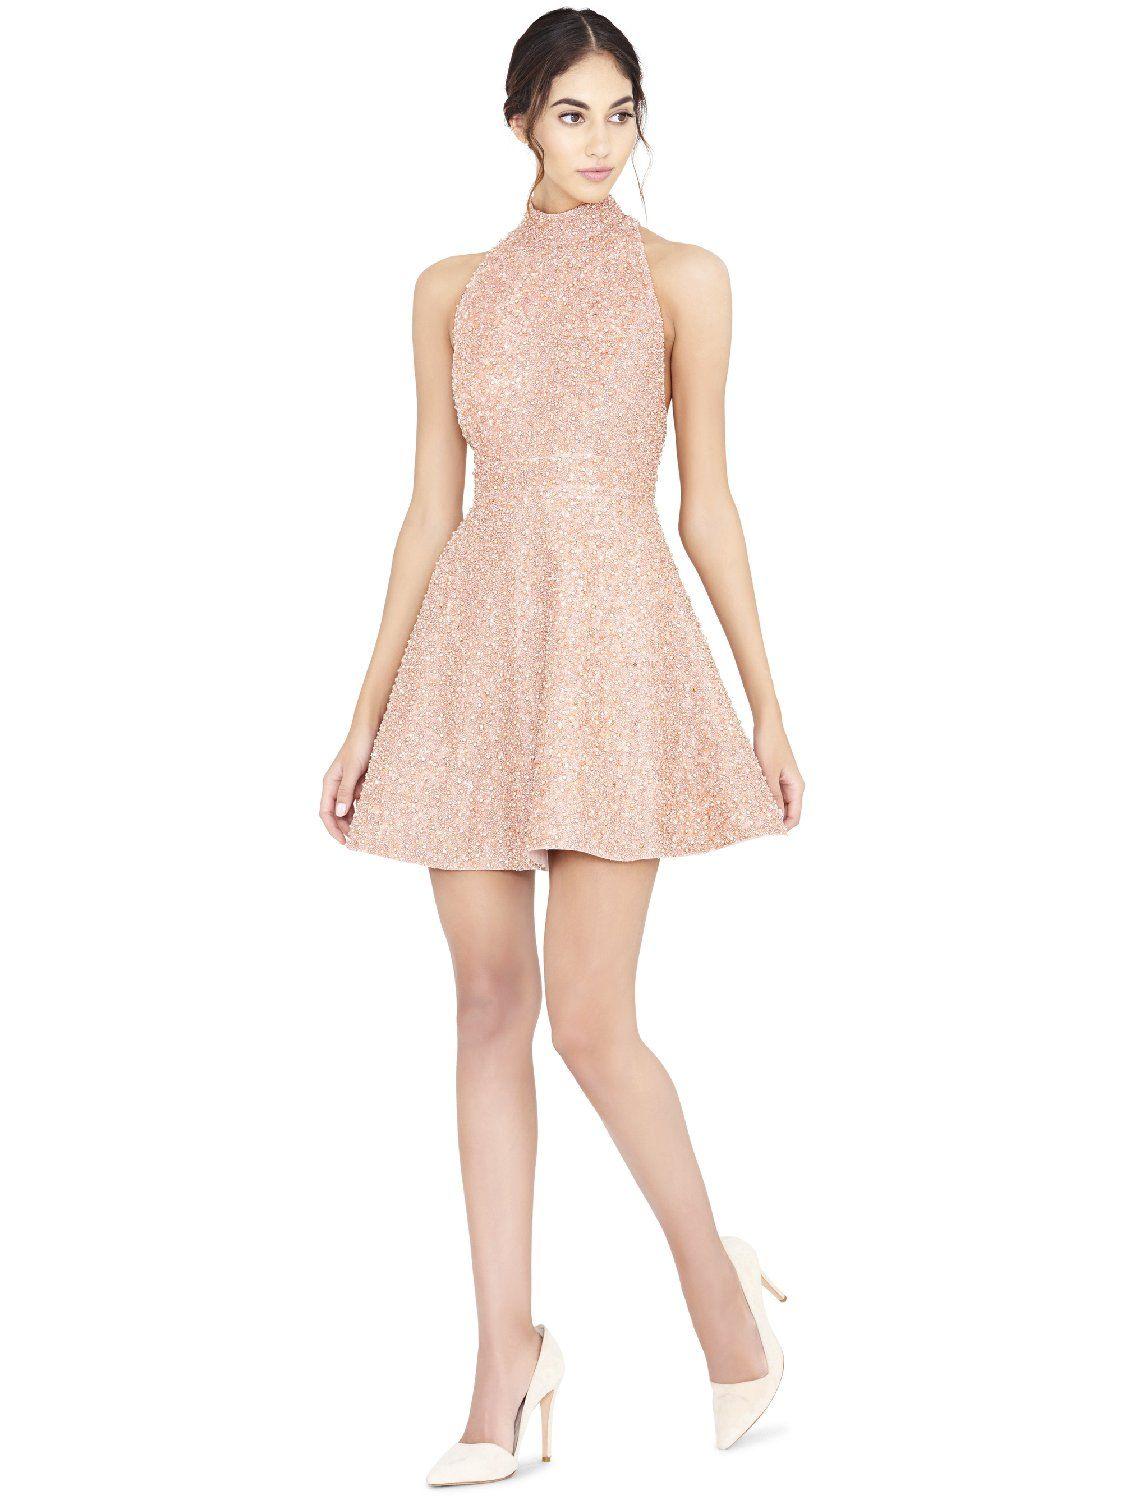 Newbury Street Boston Prom Dresses - Boutique Prom Dresses ...